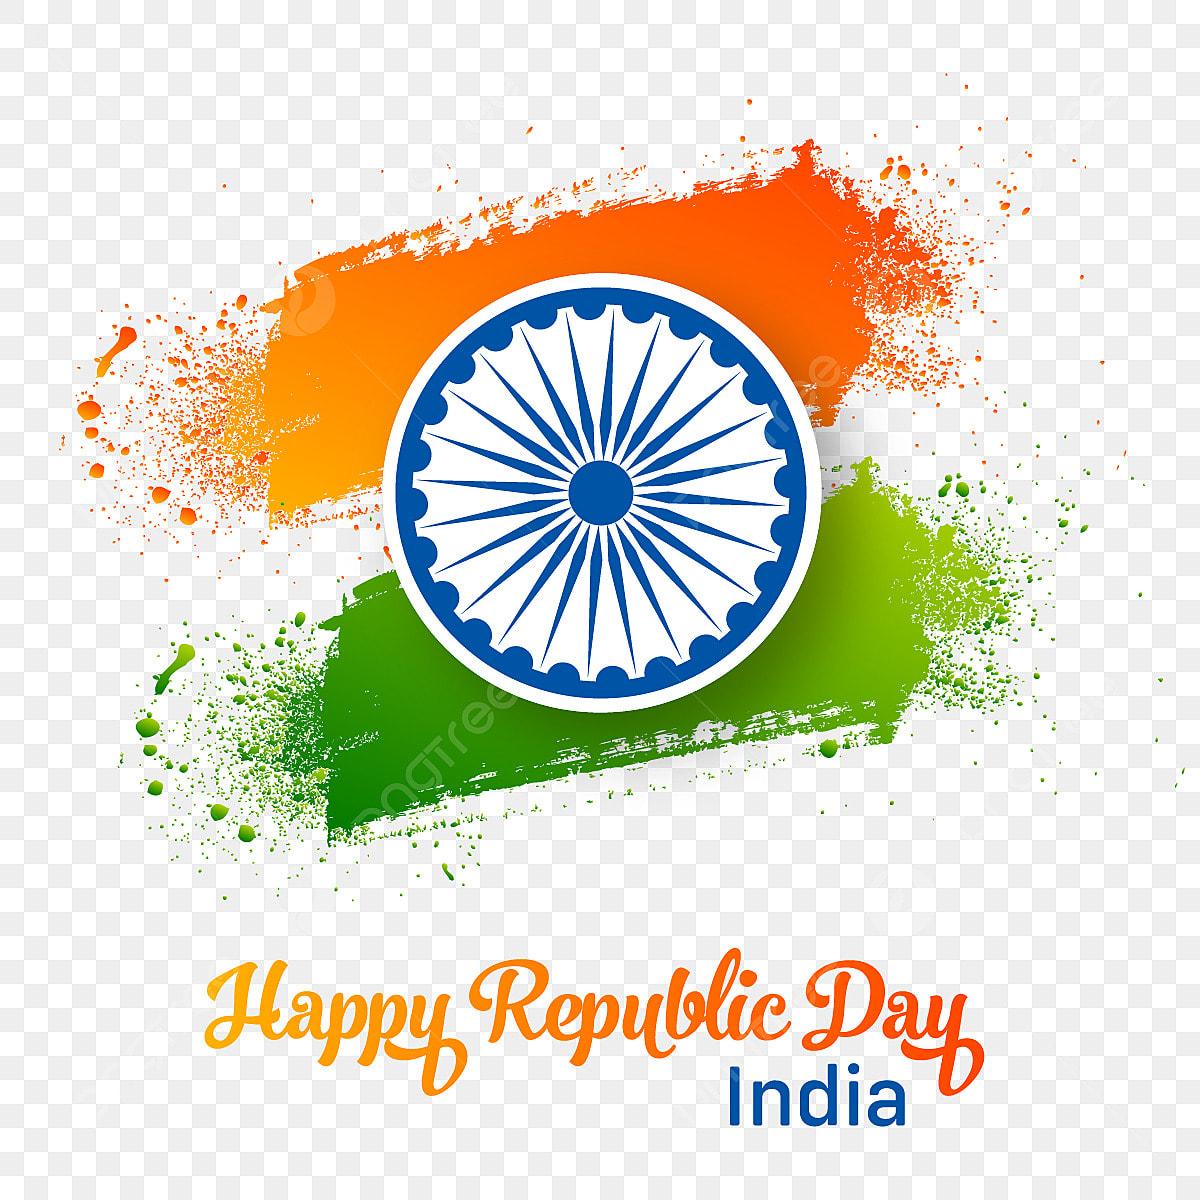 26 january image hd png creative  january happy republic day brush splash tricolor